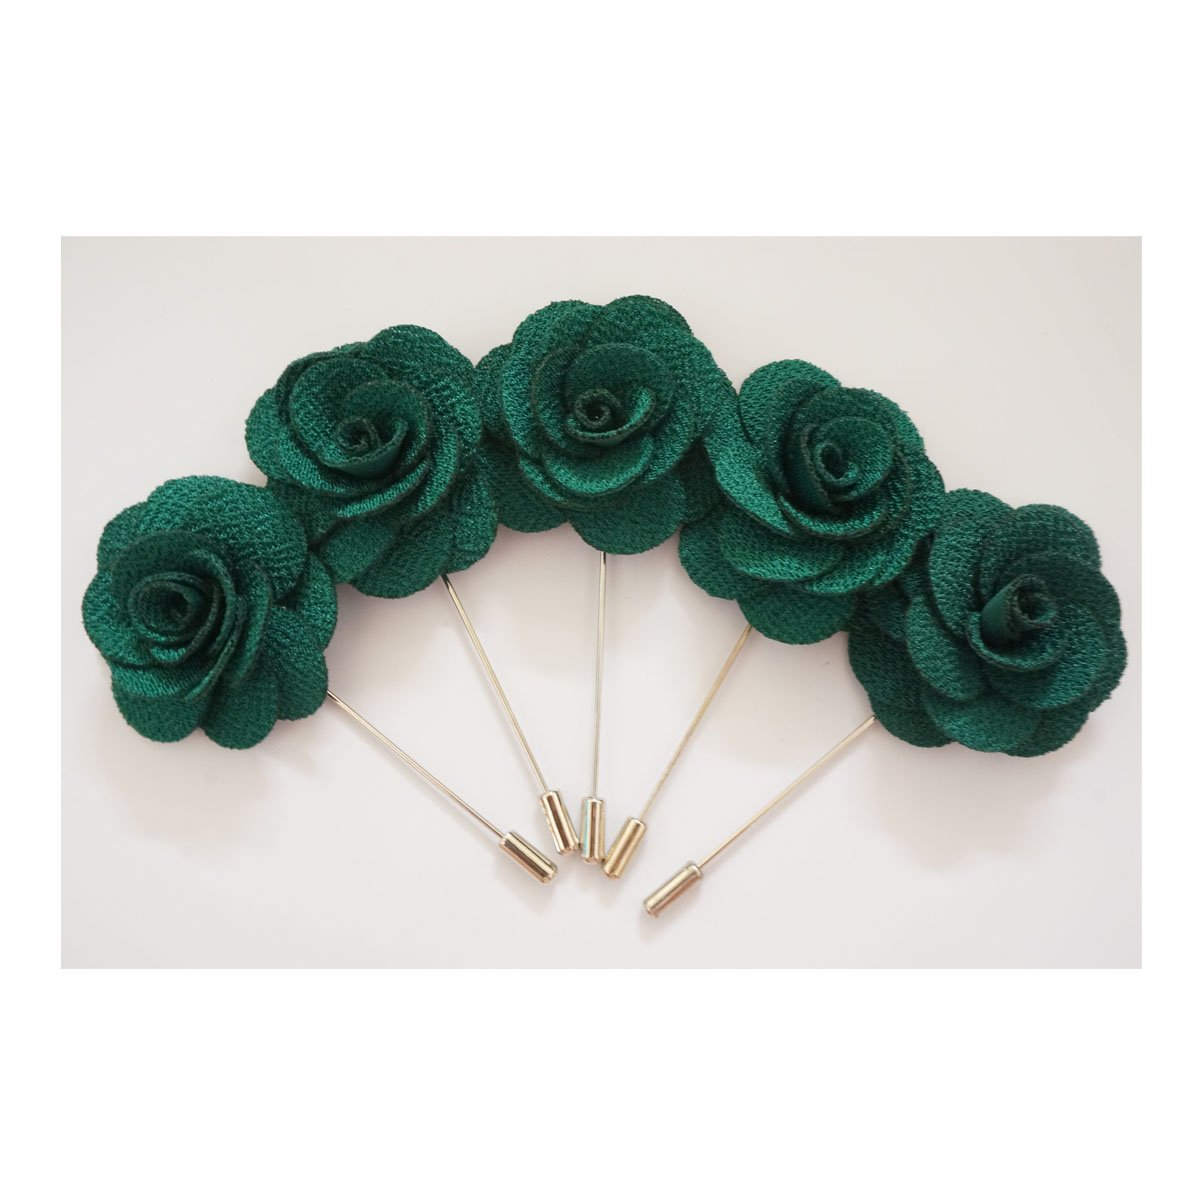 Sunny Home 5pcs Men's Lapel Flower Stick Brooch Pin Boutonniere for Suit (Black)